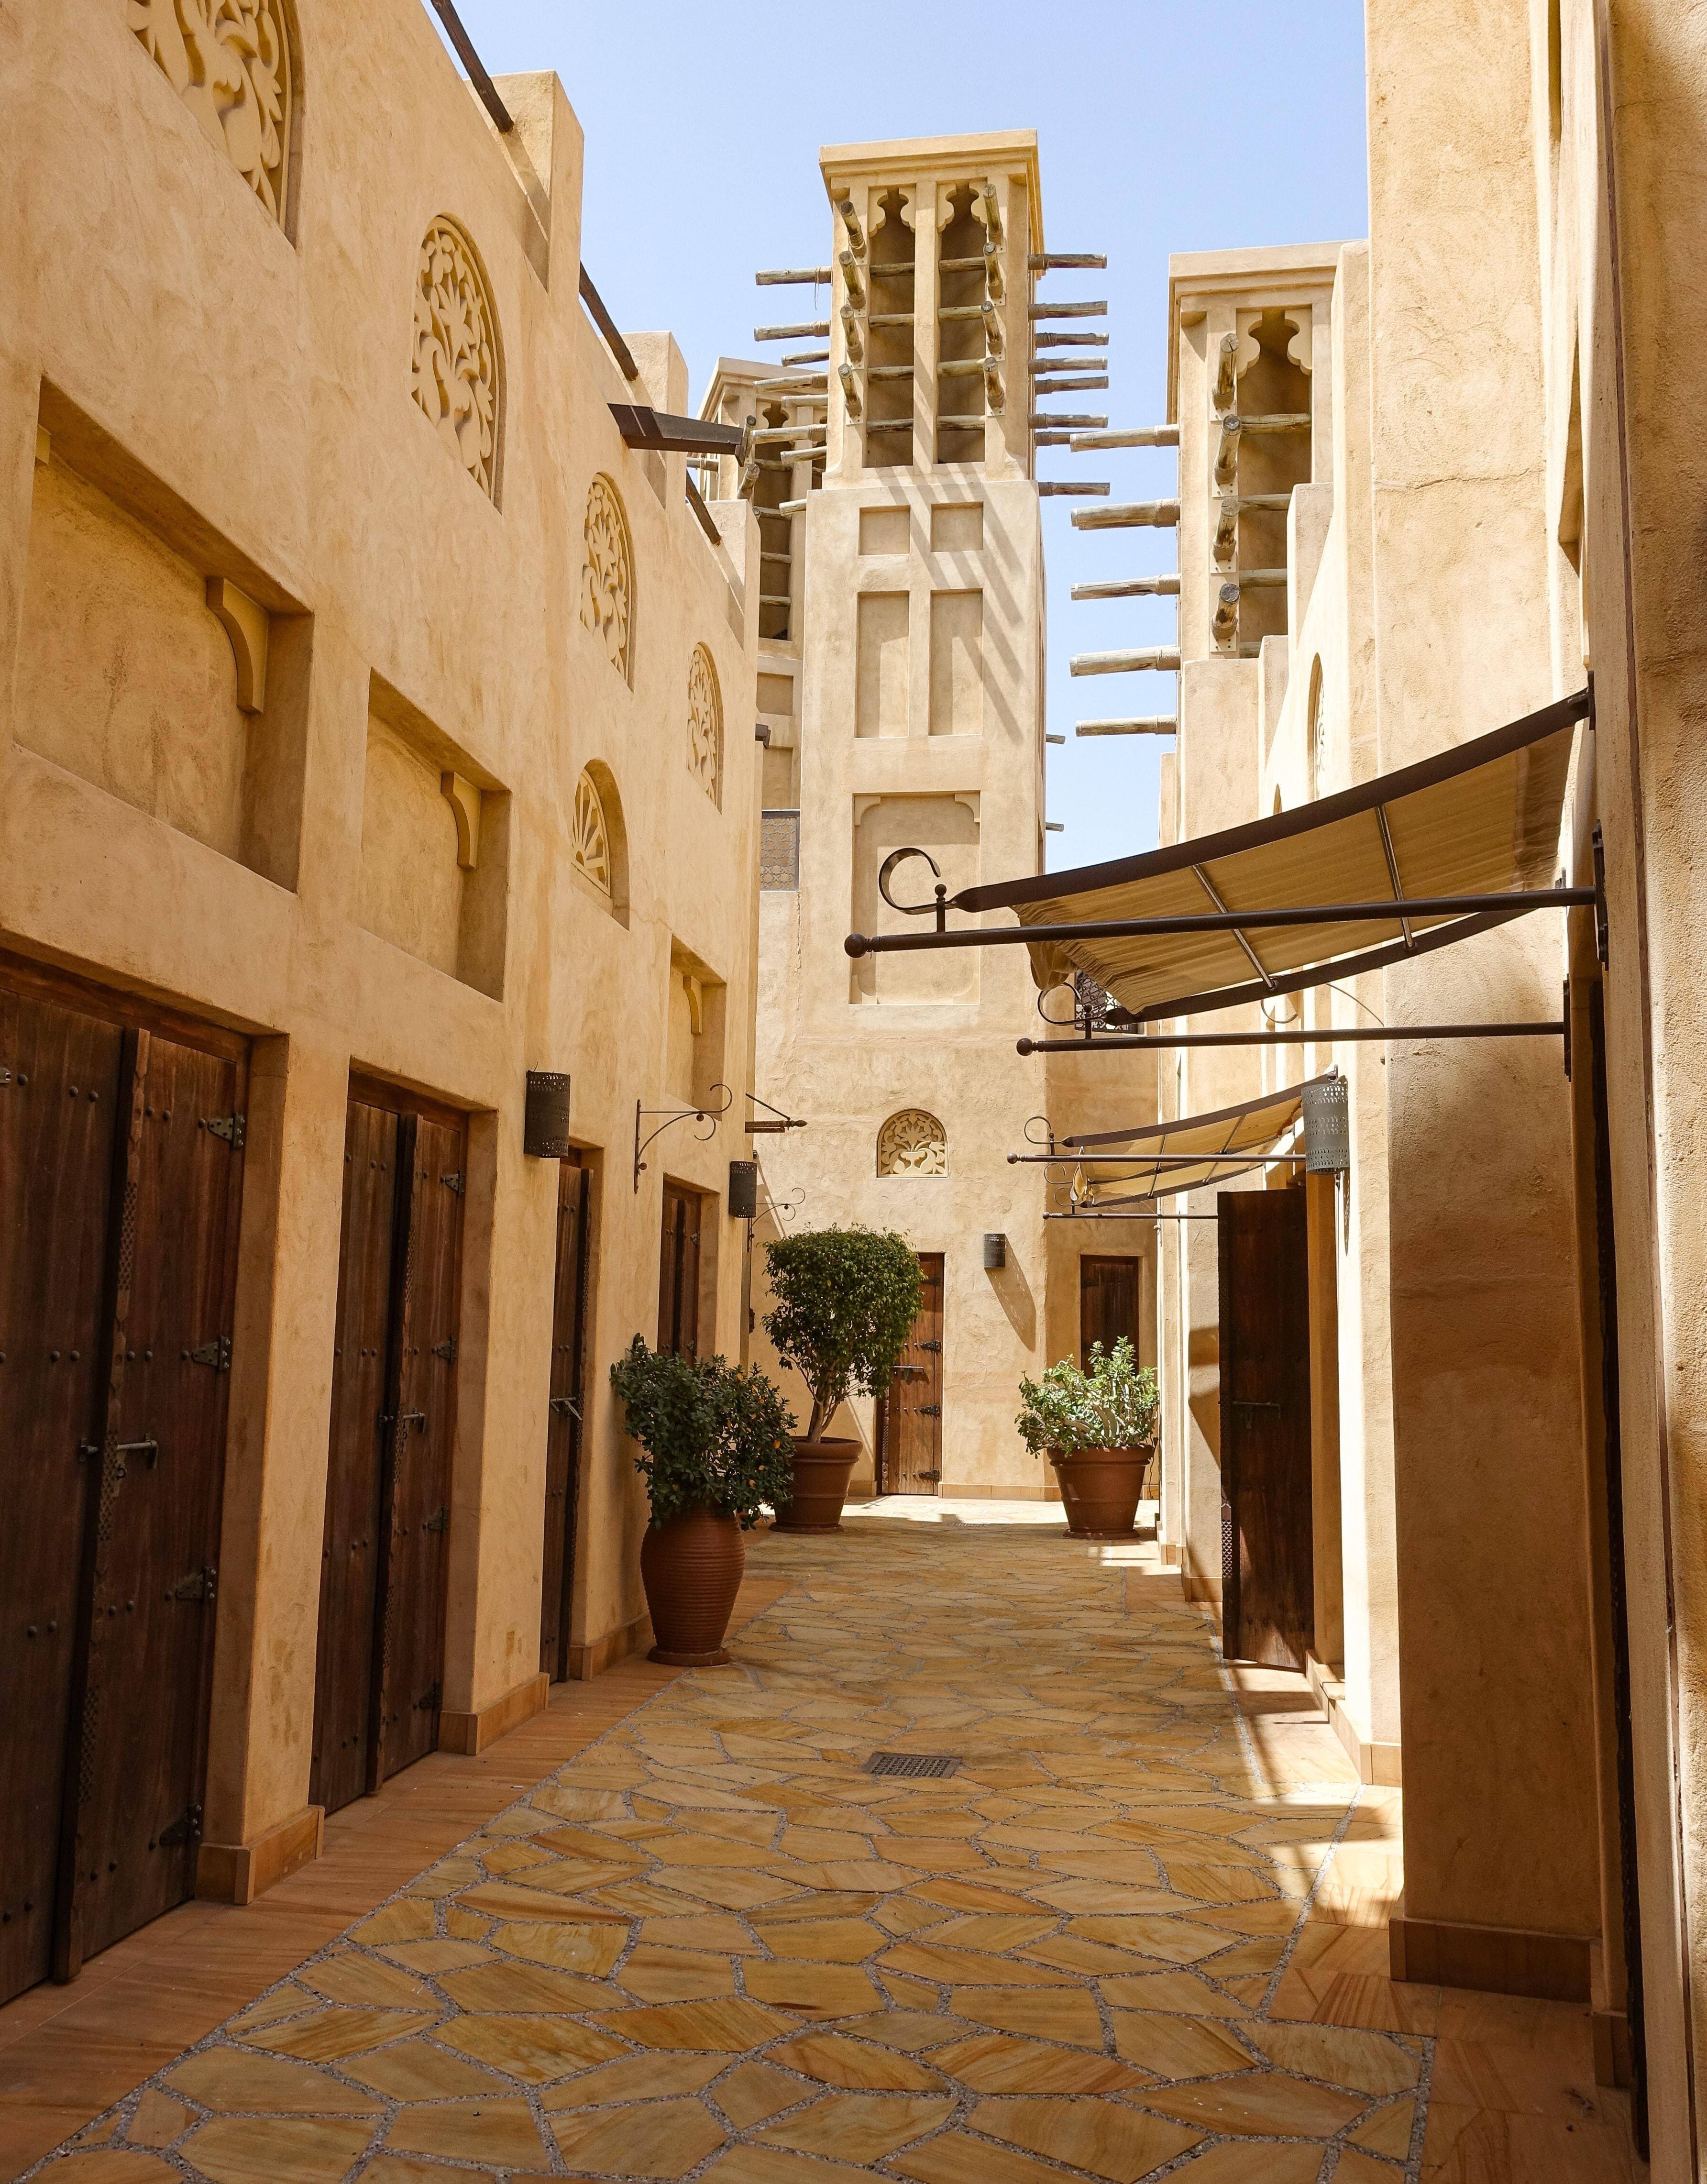 Best Places to Visit in Dubai - Souk Madinat Jumeirah - 1